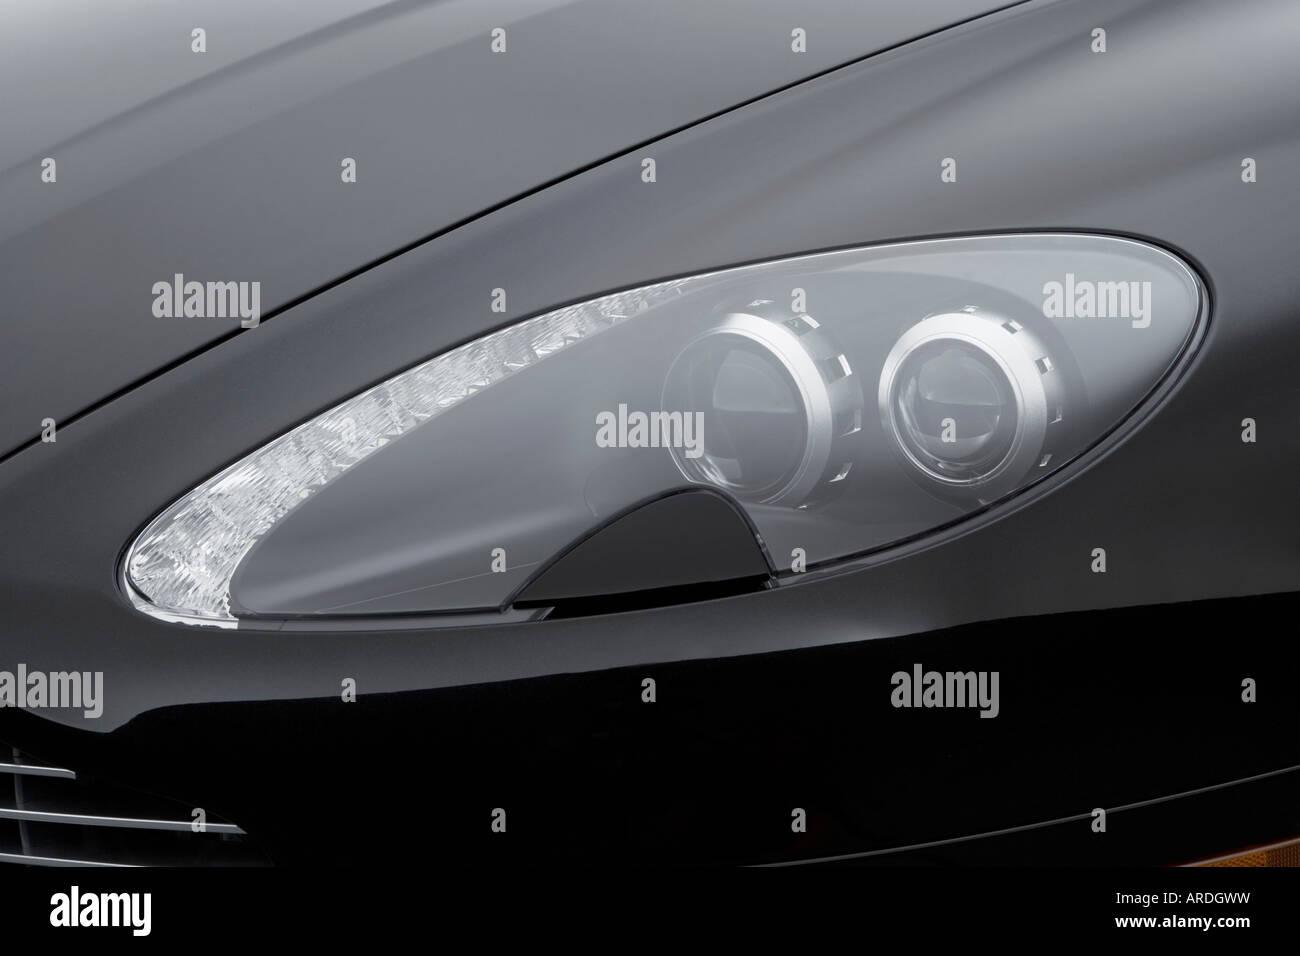 2006 Aston Martin V8 Vantage In Black Headlight Stock Photo Alamy